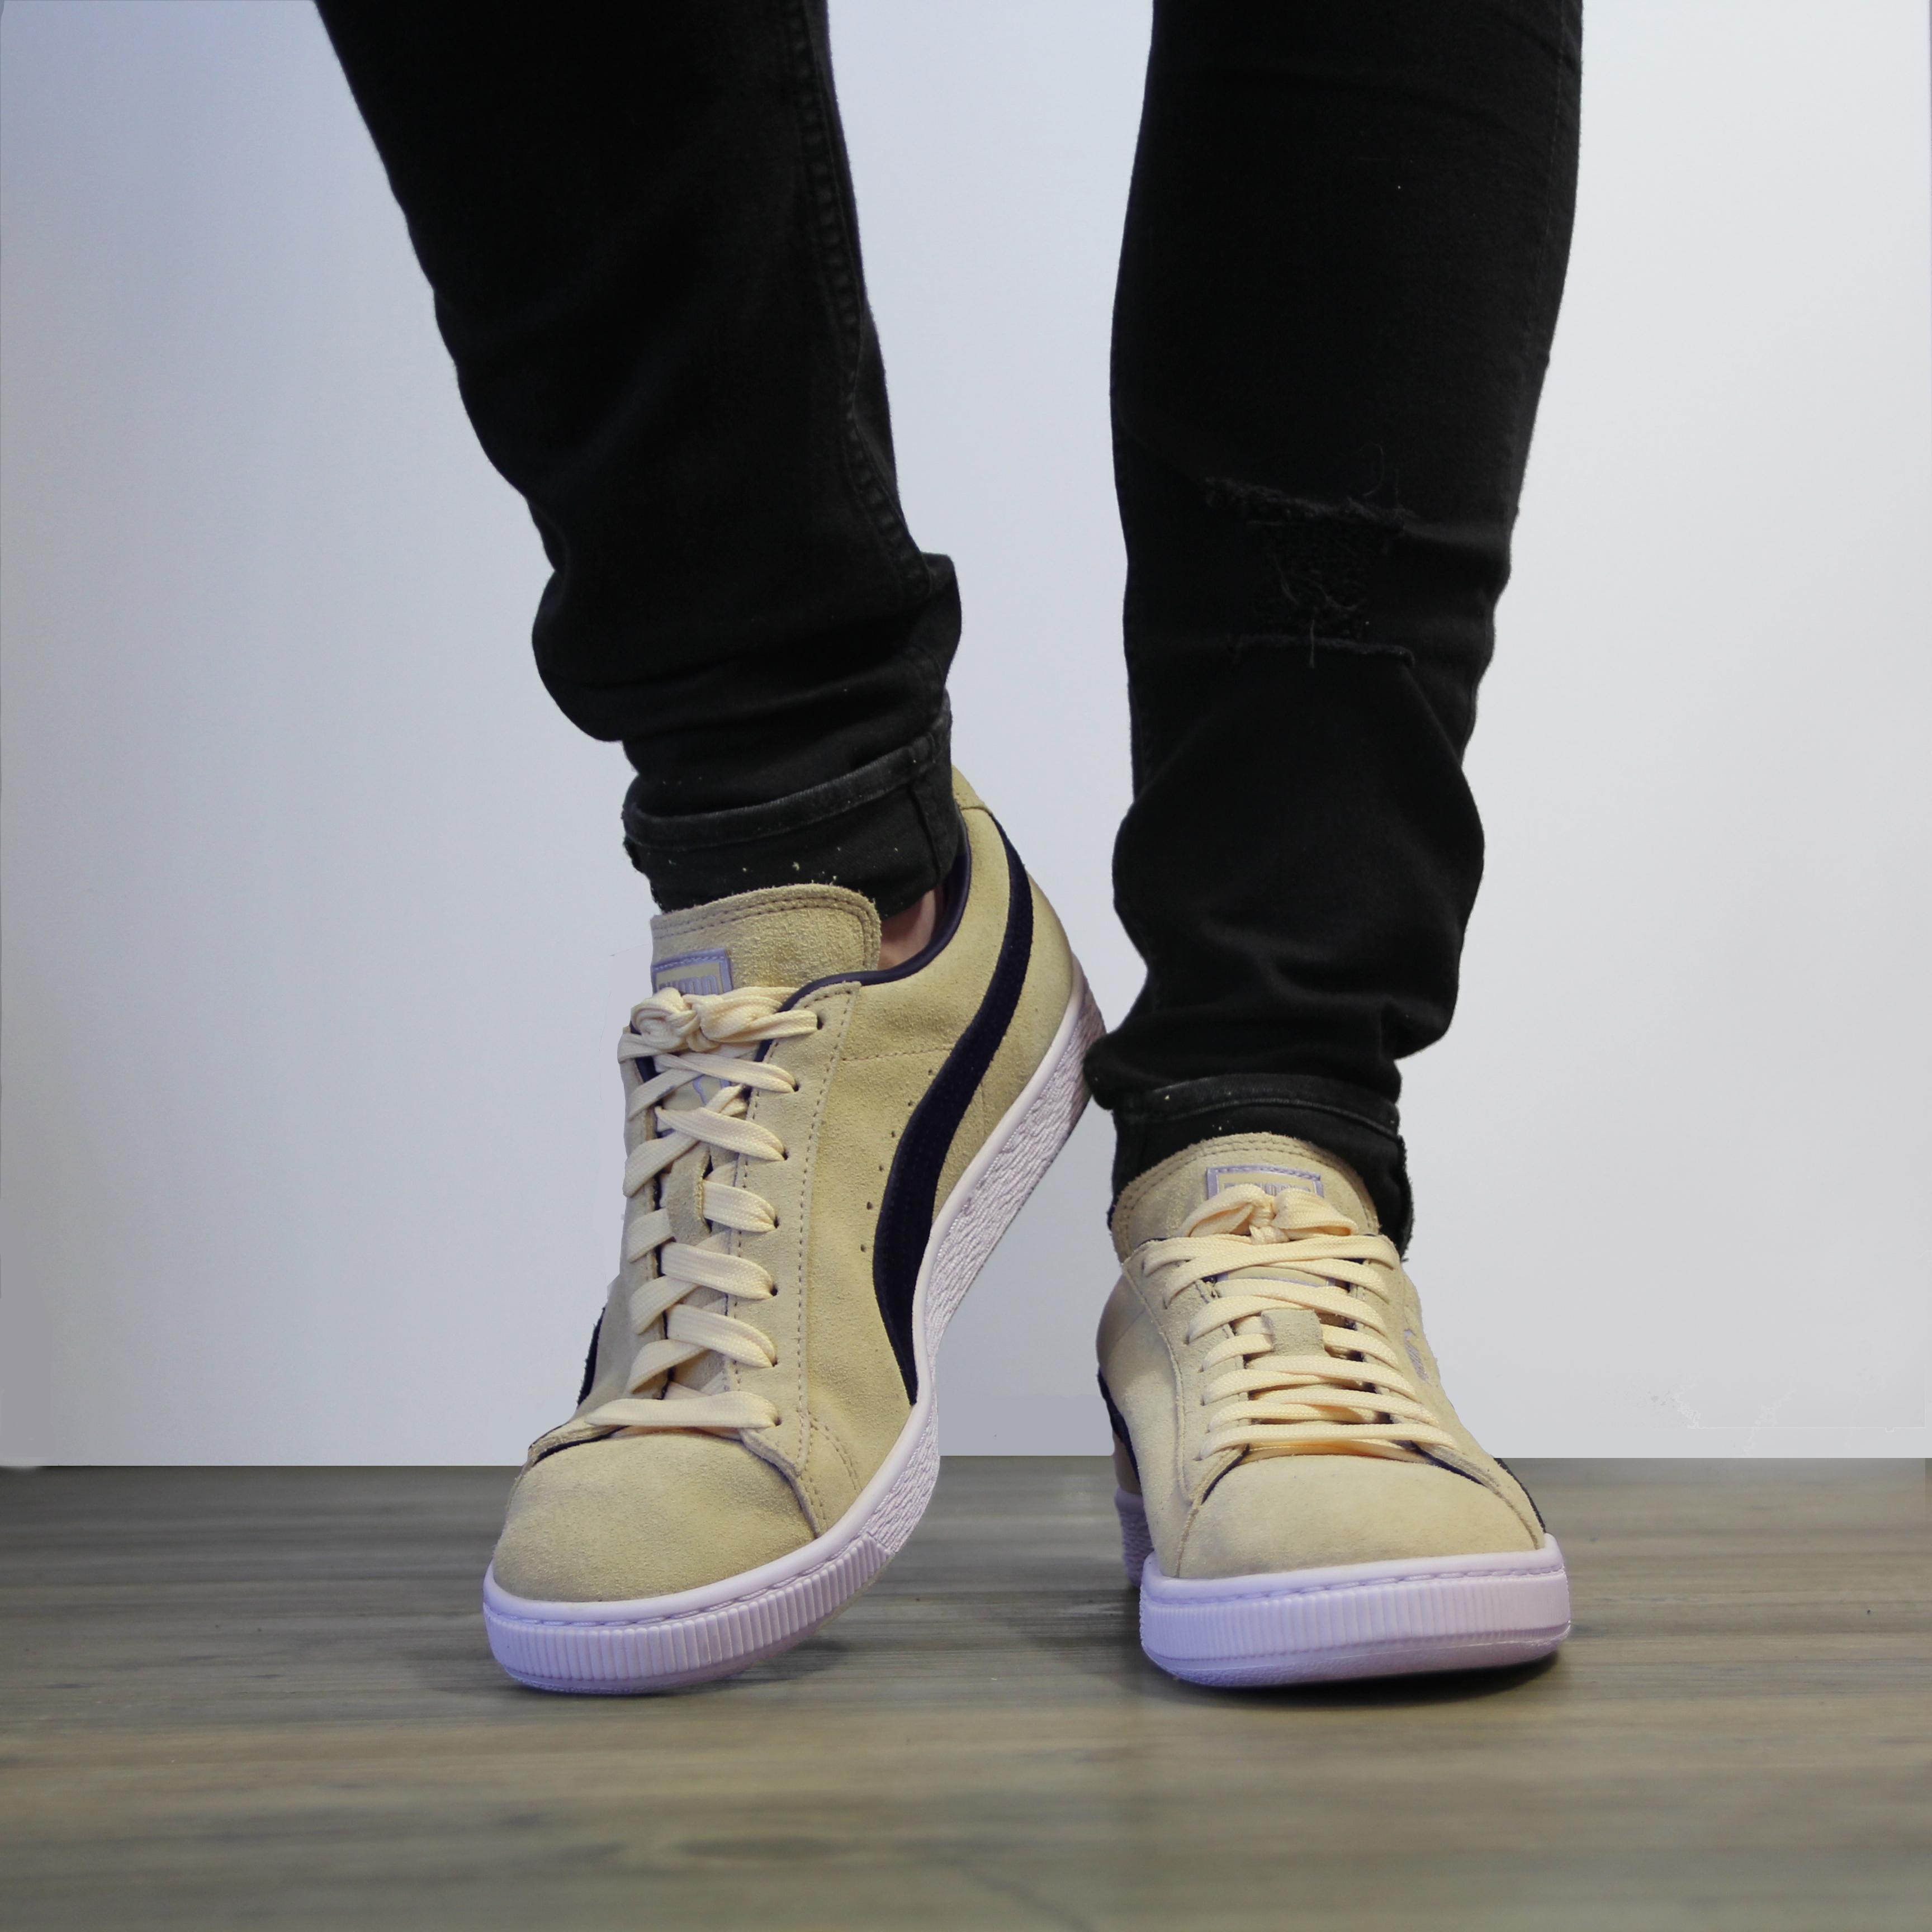 Suede Mode Chaussures Classic Puma Cuir Unisex Sneakers 1dqTq